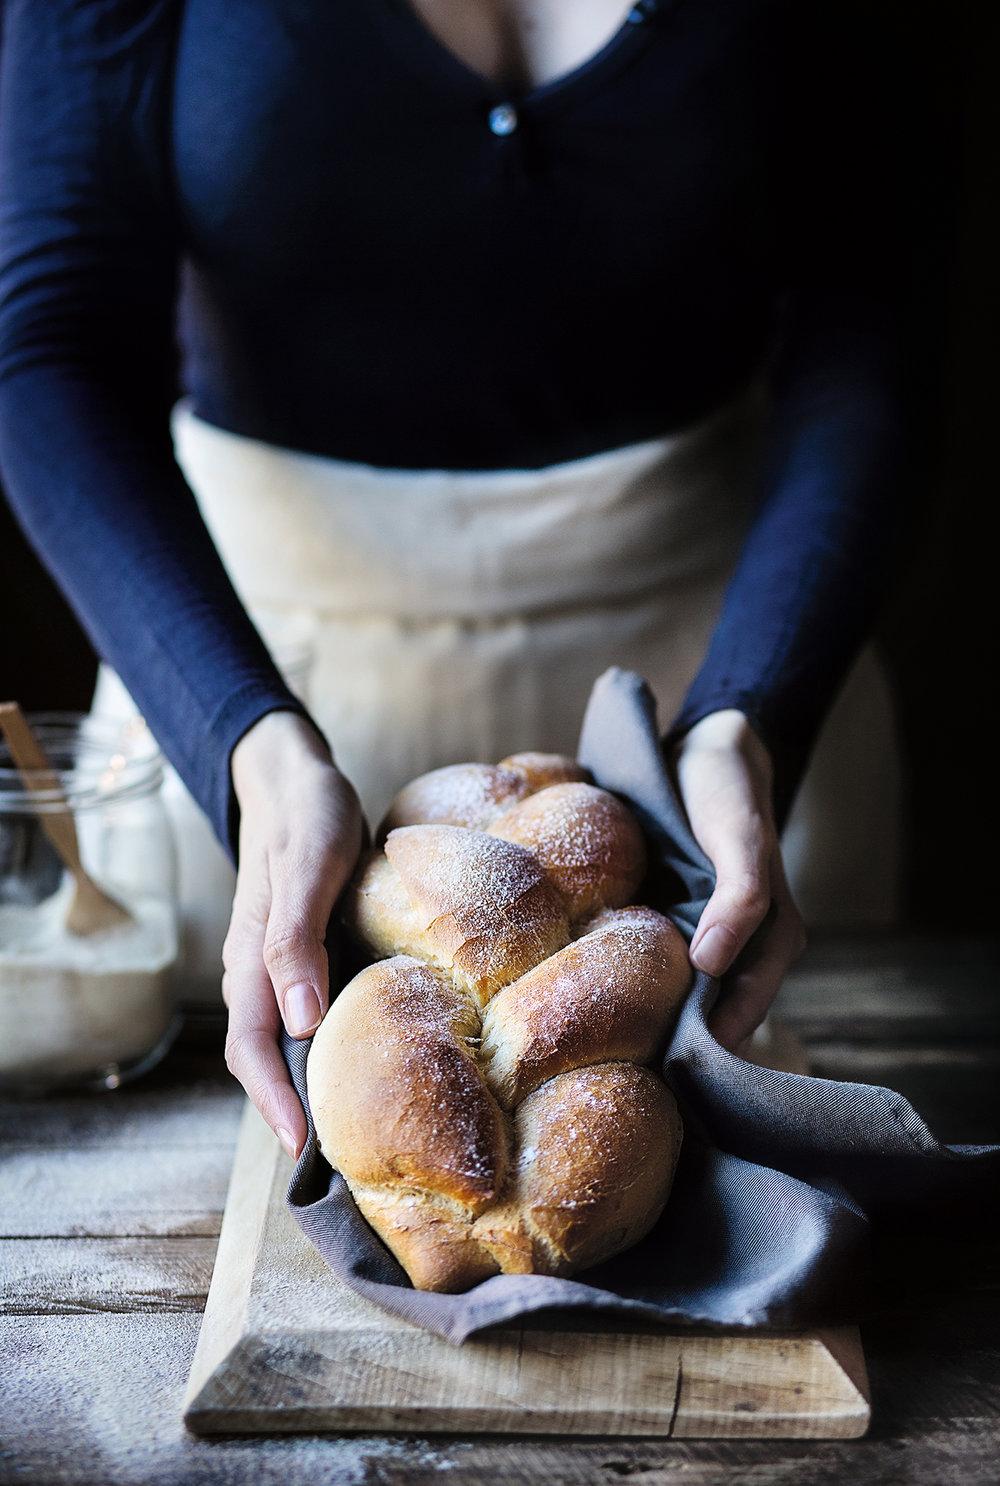 Copy of Woman holding fresh braided bread